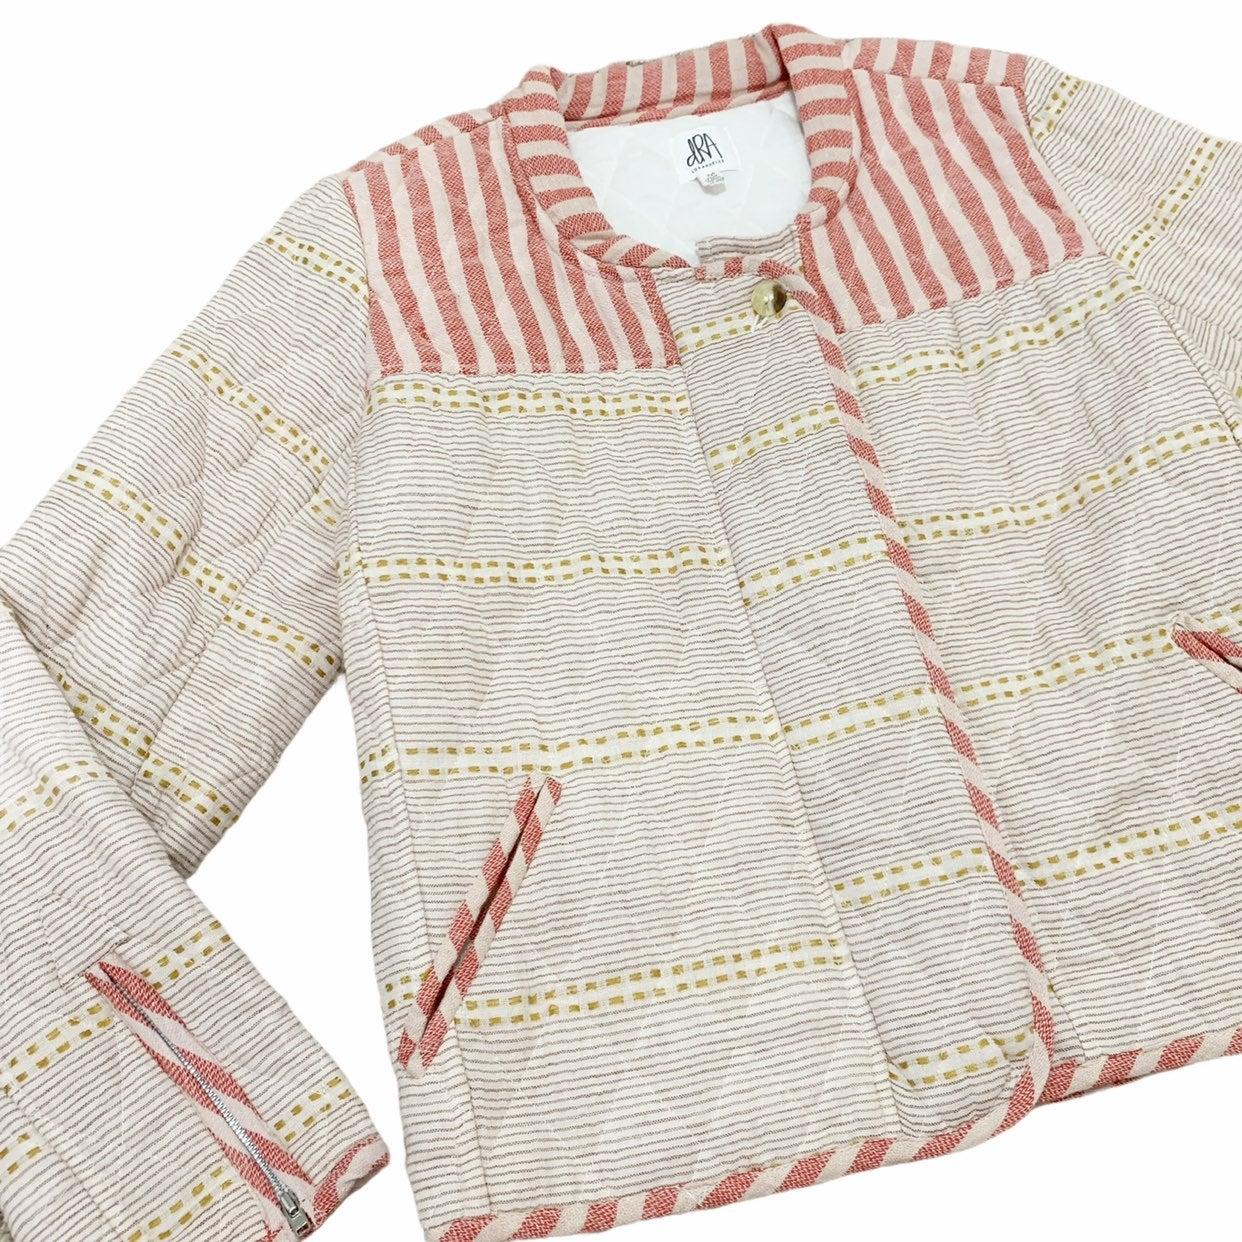 Anthro DRA Striped Jacket Coat Medium